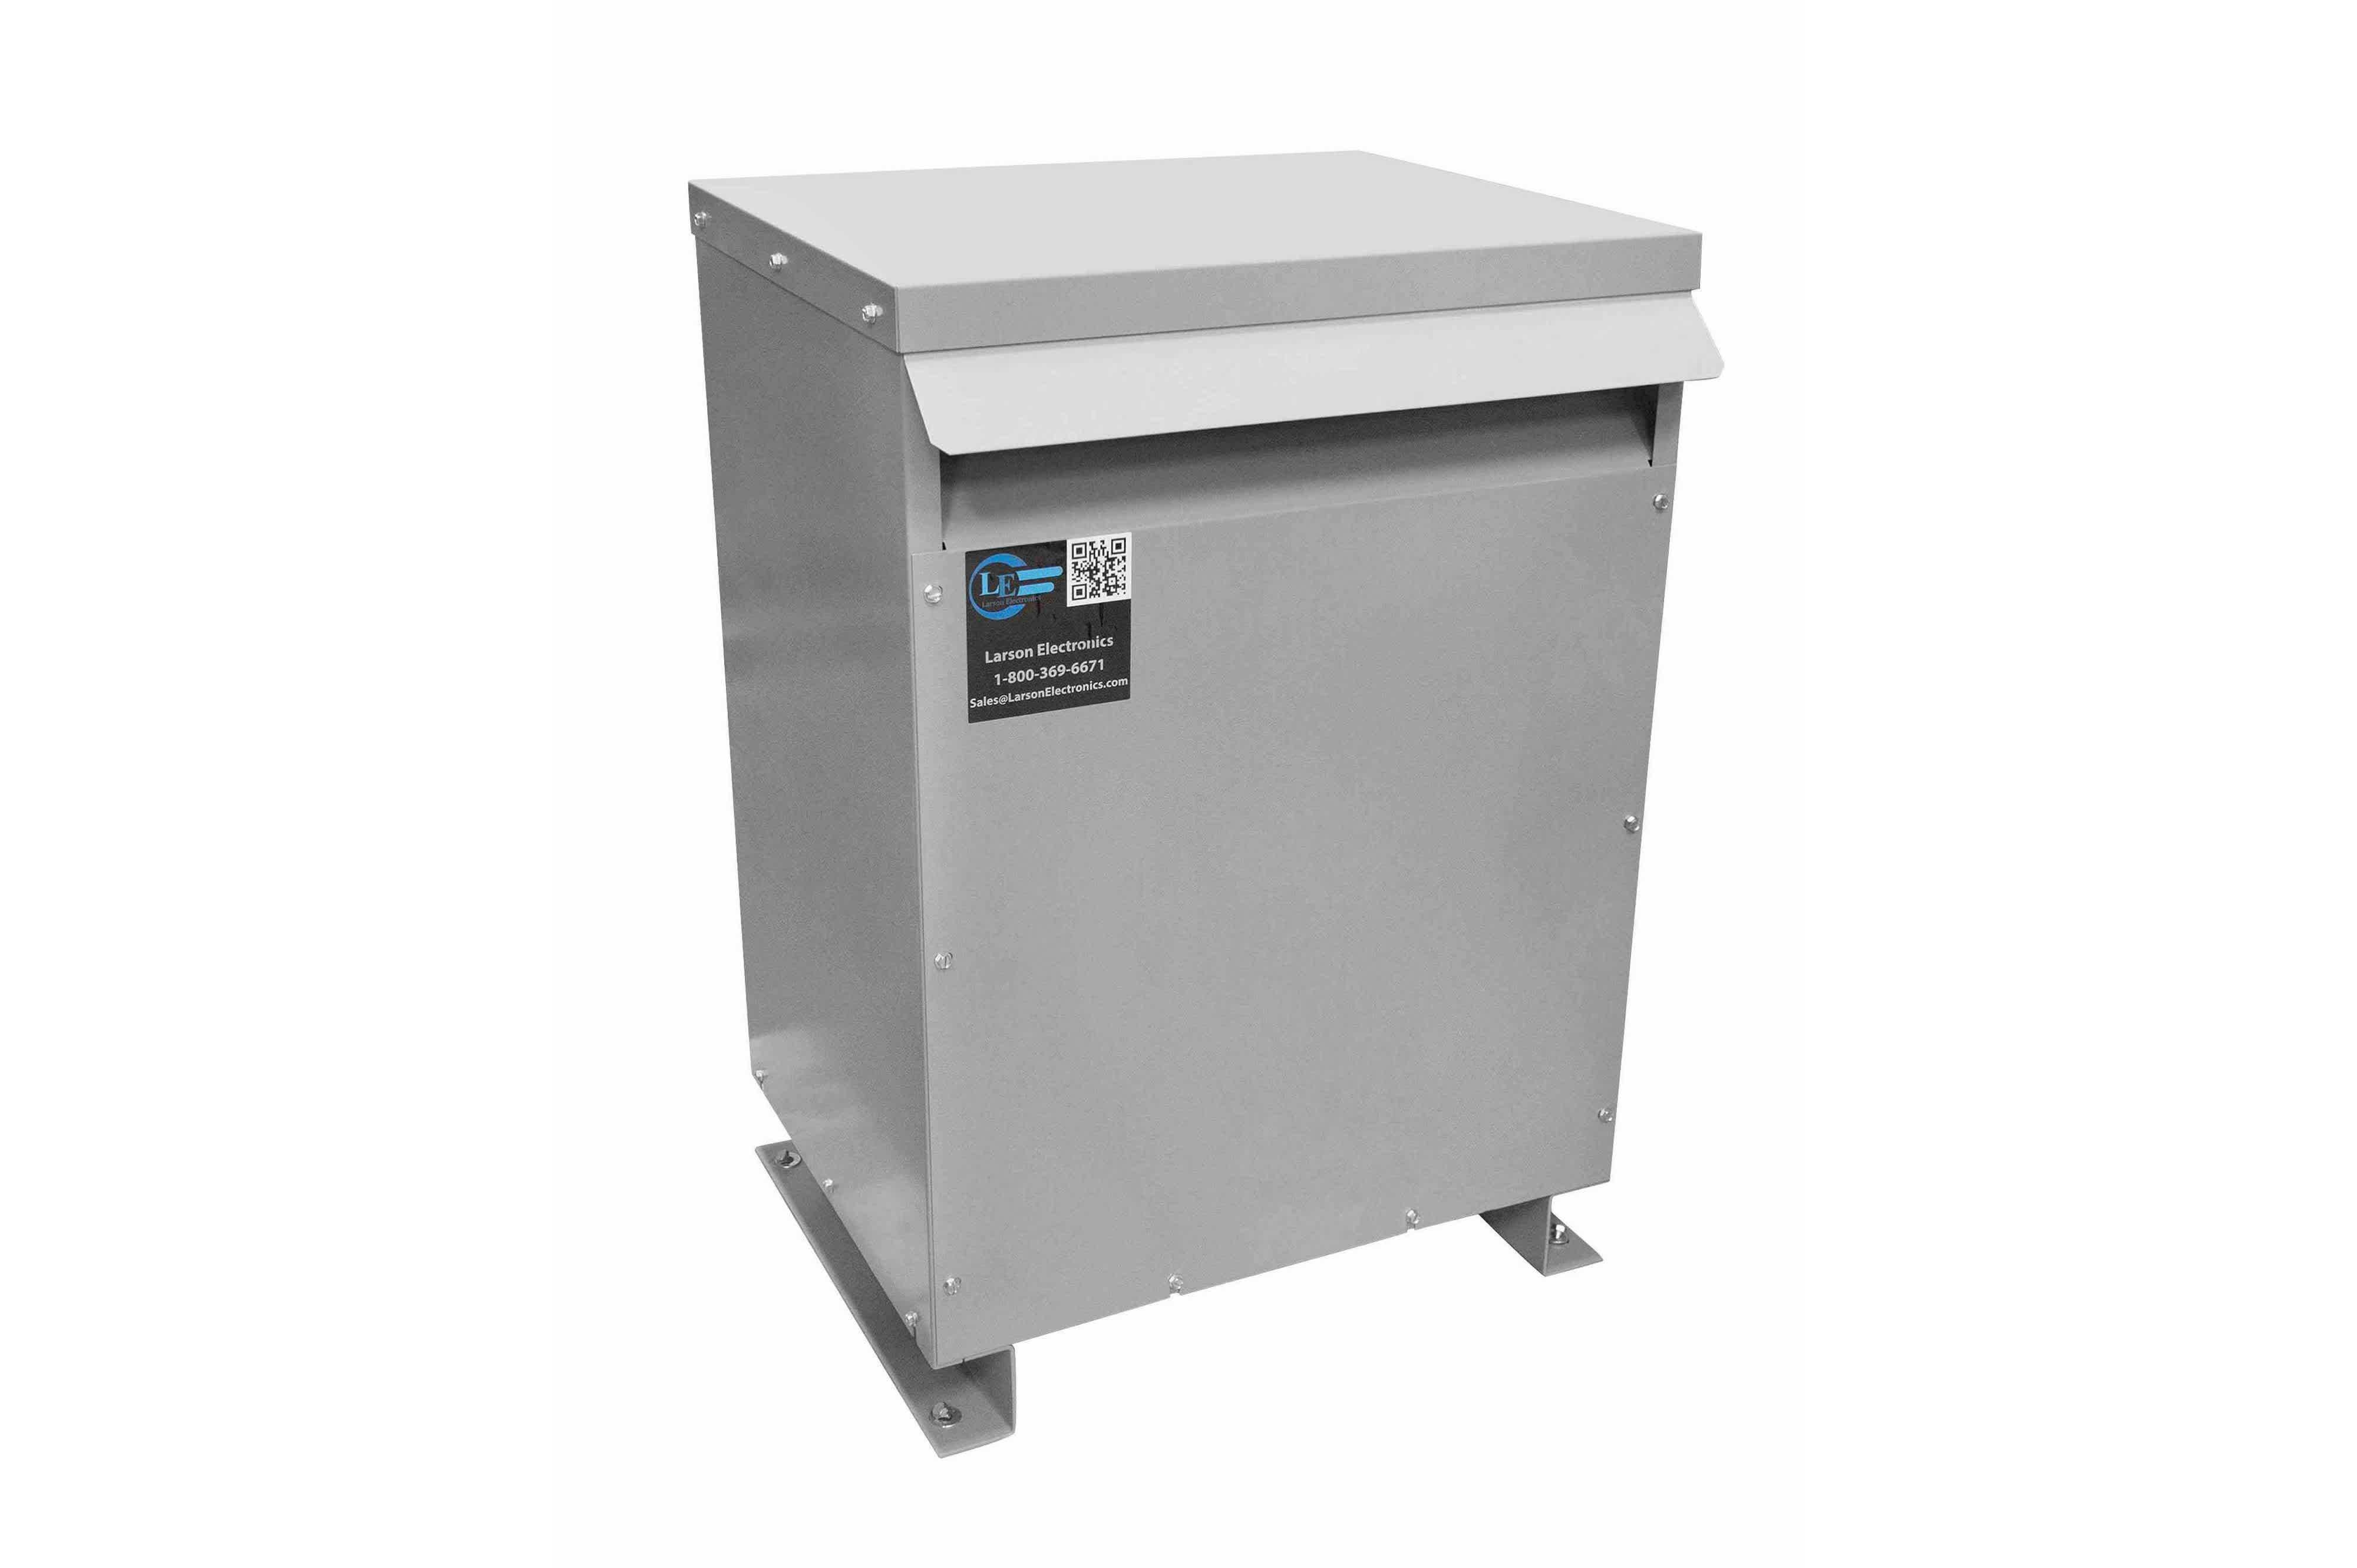 65 kVA 3PH Isolation Transformer, 460V Wye Primary, 575Y/332 Wye-N Secondary, N3R, Ventilated, 60 Hz